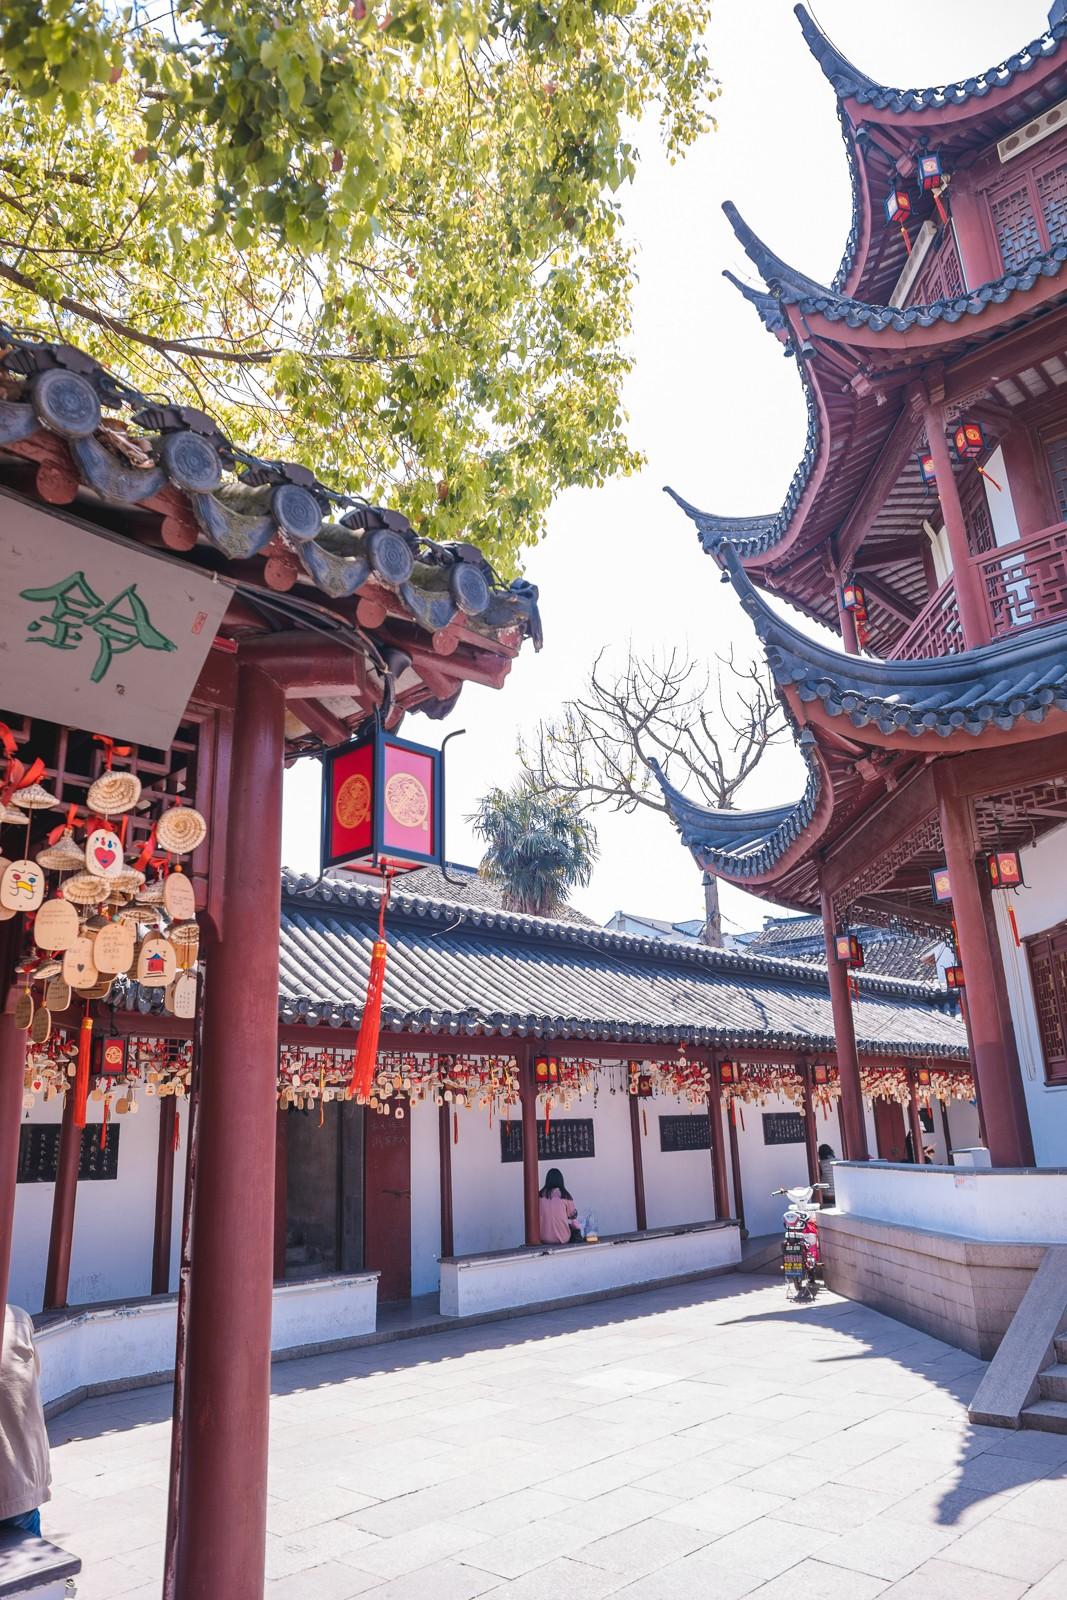 shanghaï, chine, voyage, lujia zui, blog, travel, visite china, photographie